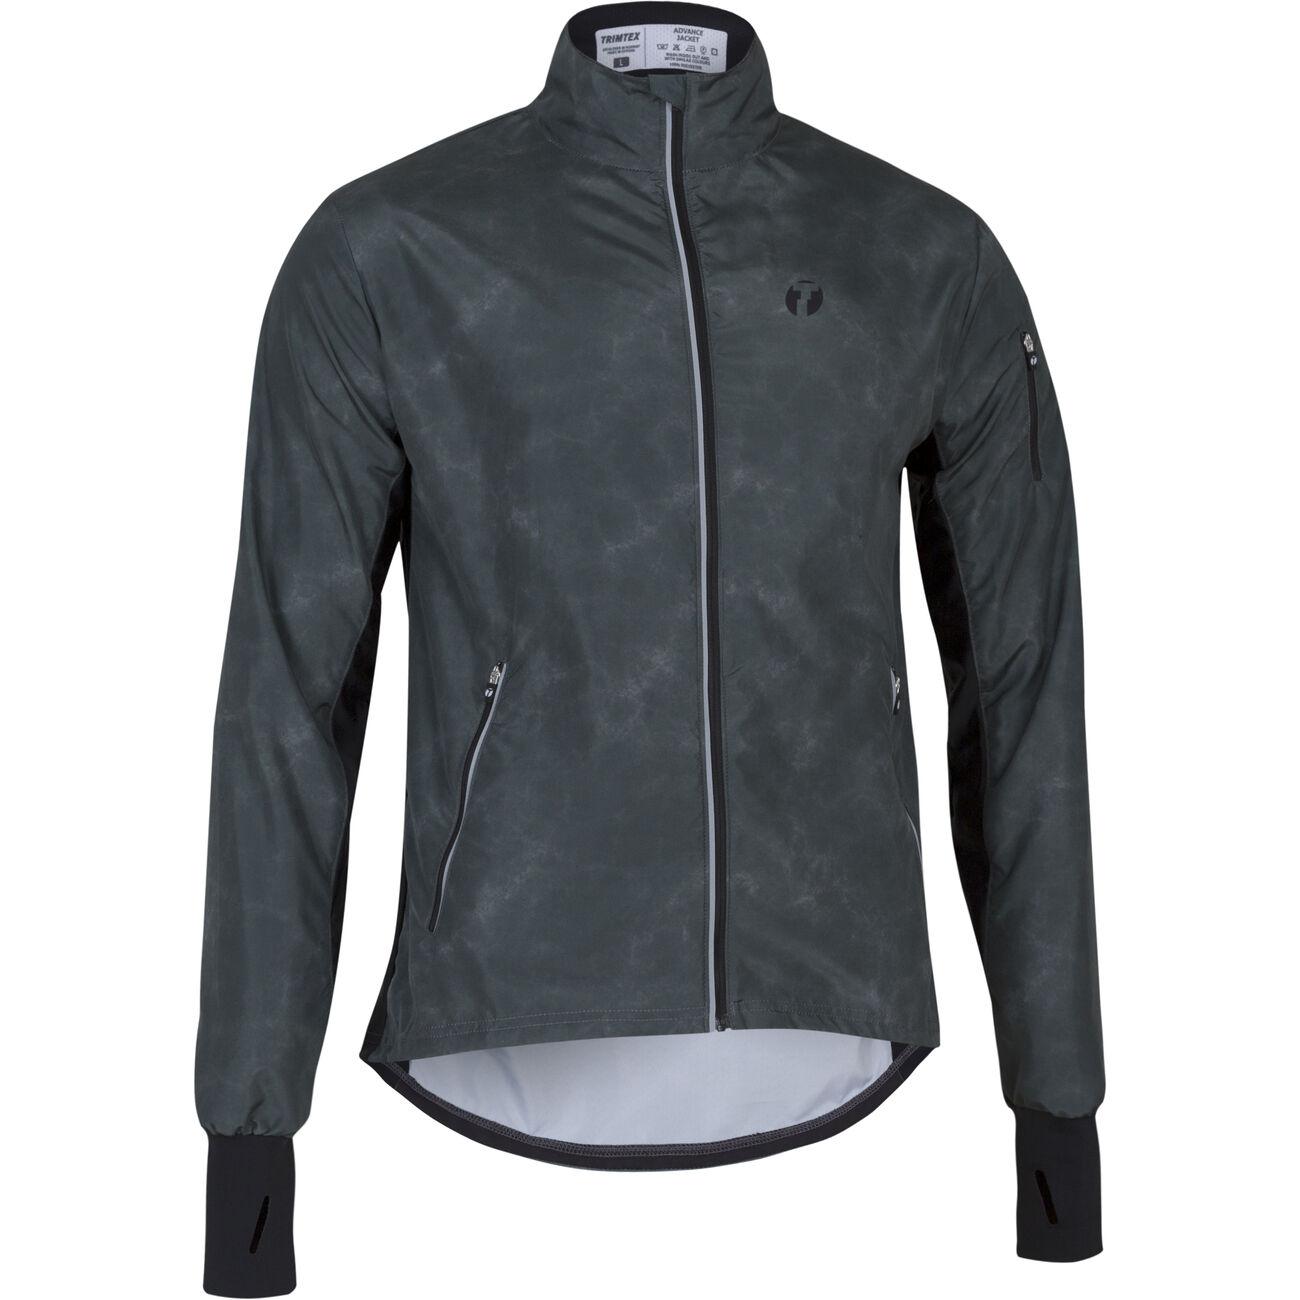 Advance running jacket men's